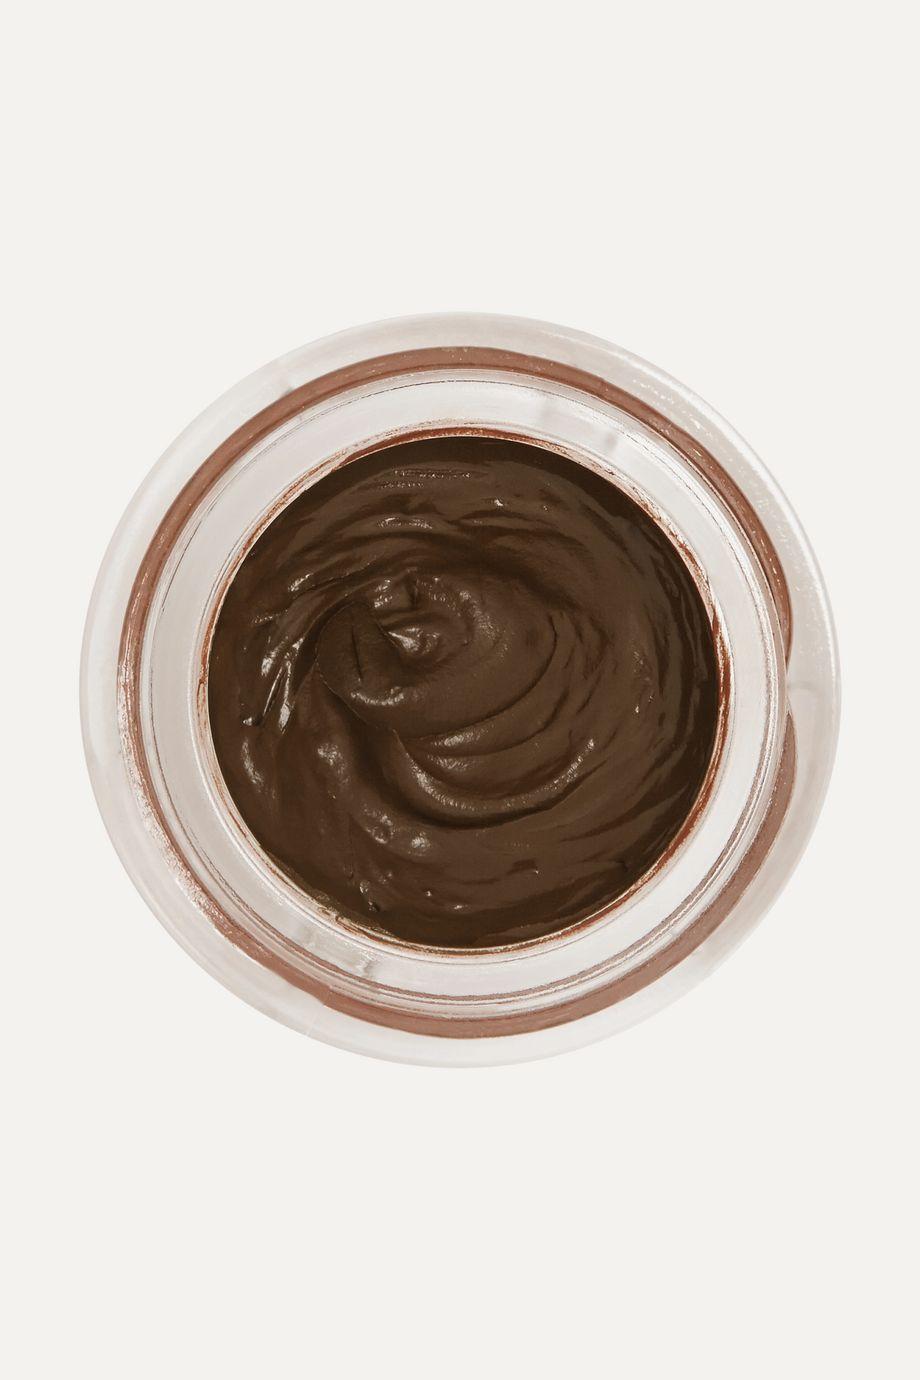 Illamasqua Precision Brow Gel – Strike, 5 ml – Augenbrauengel